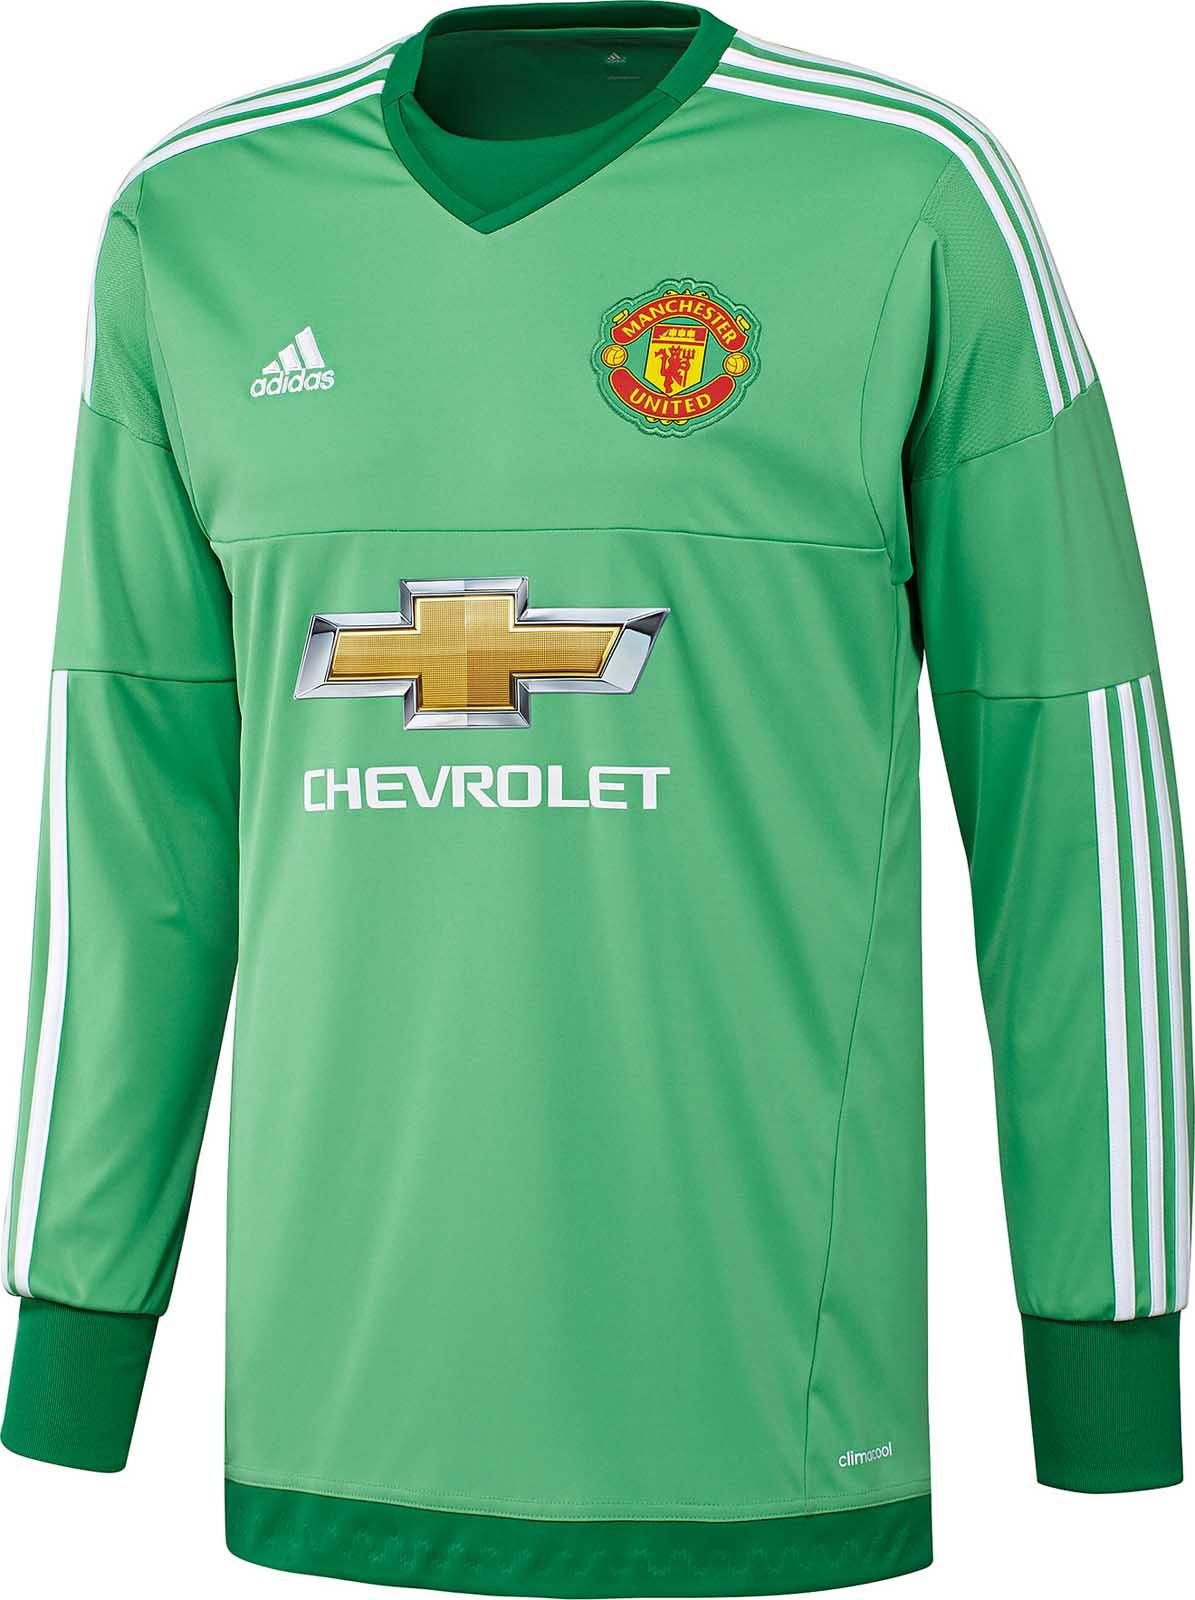 on sale df044 a925e man utd goalie kit